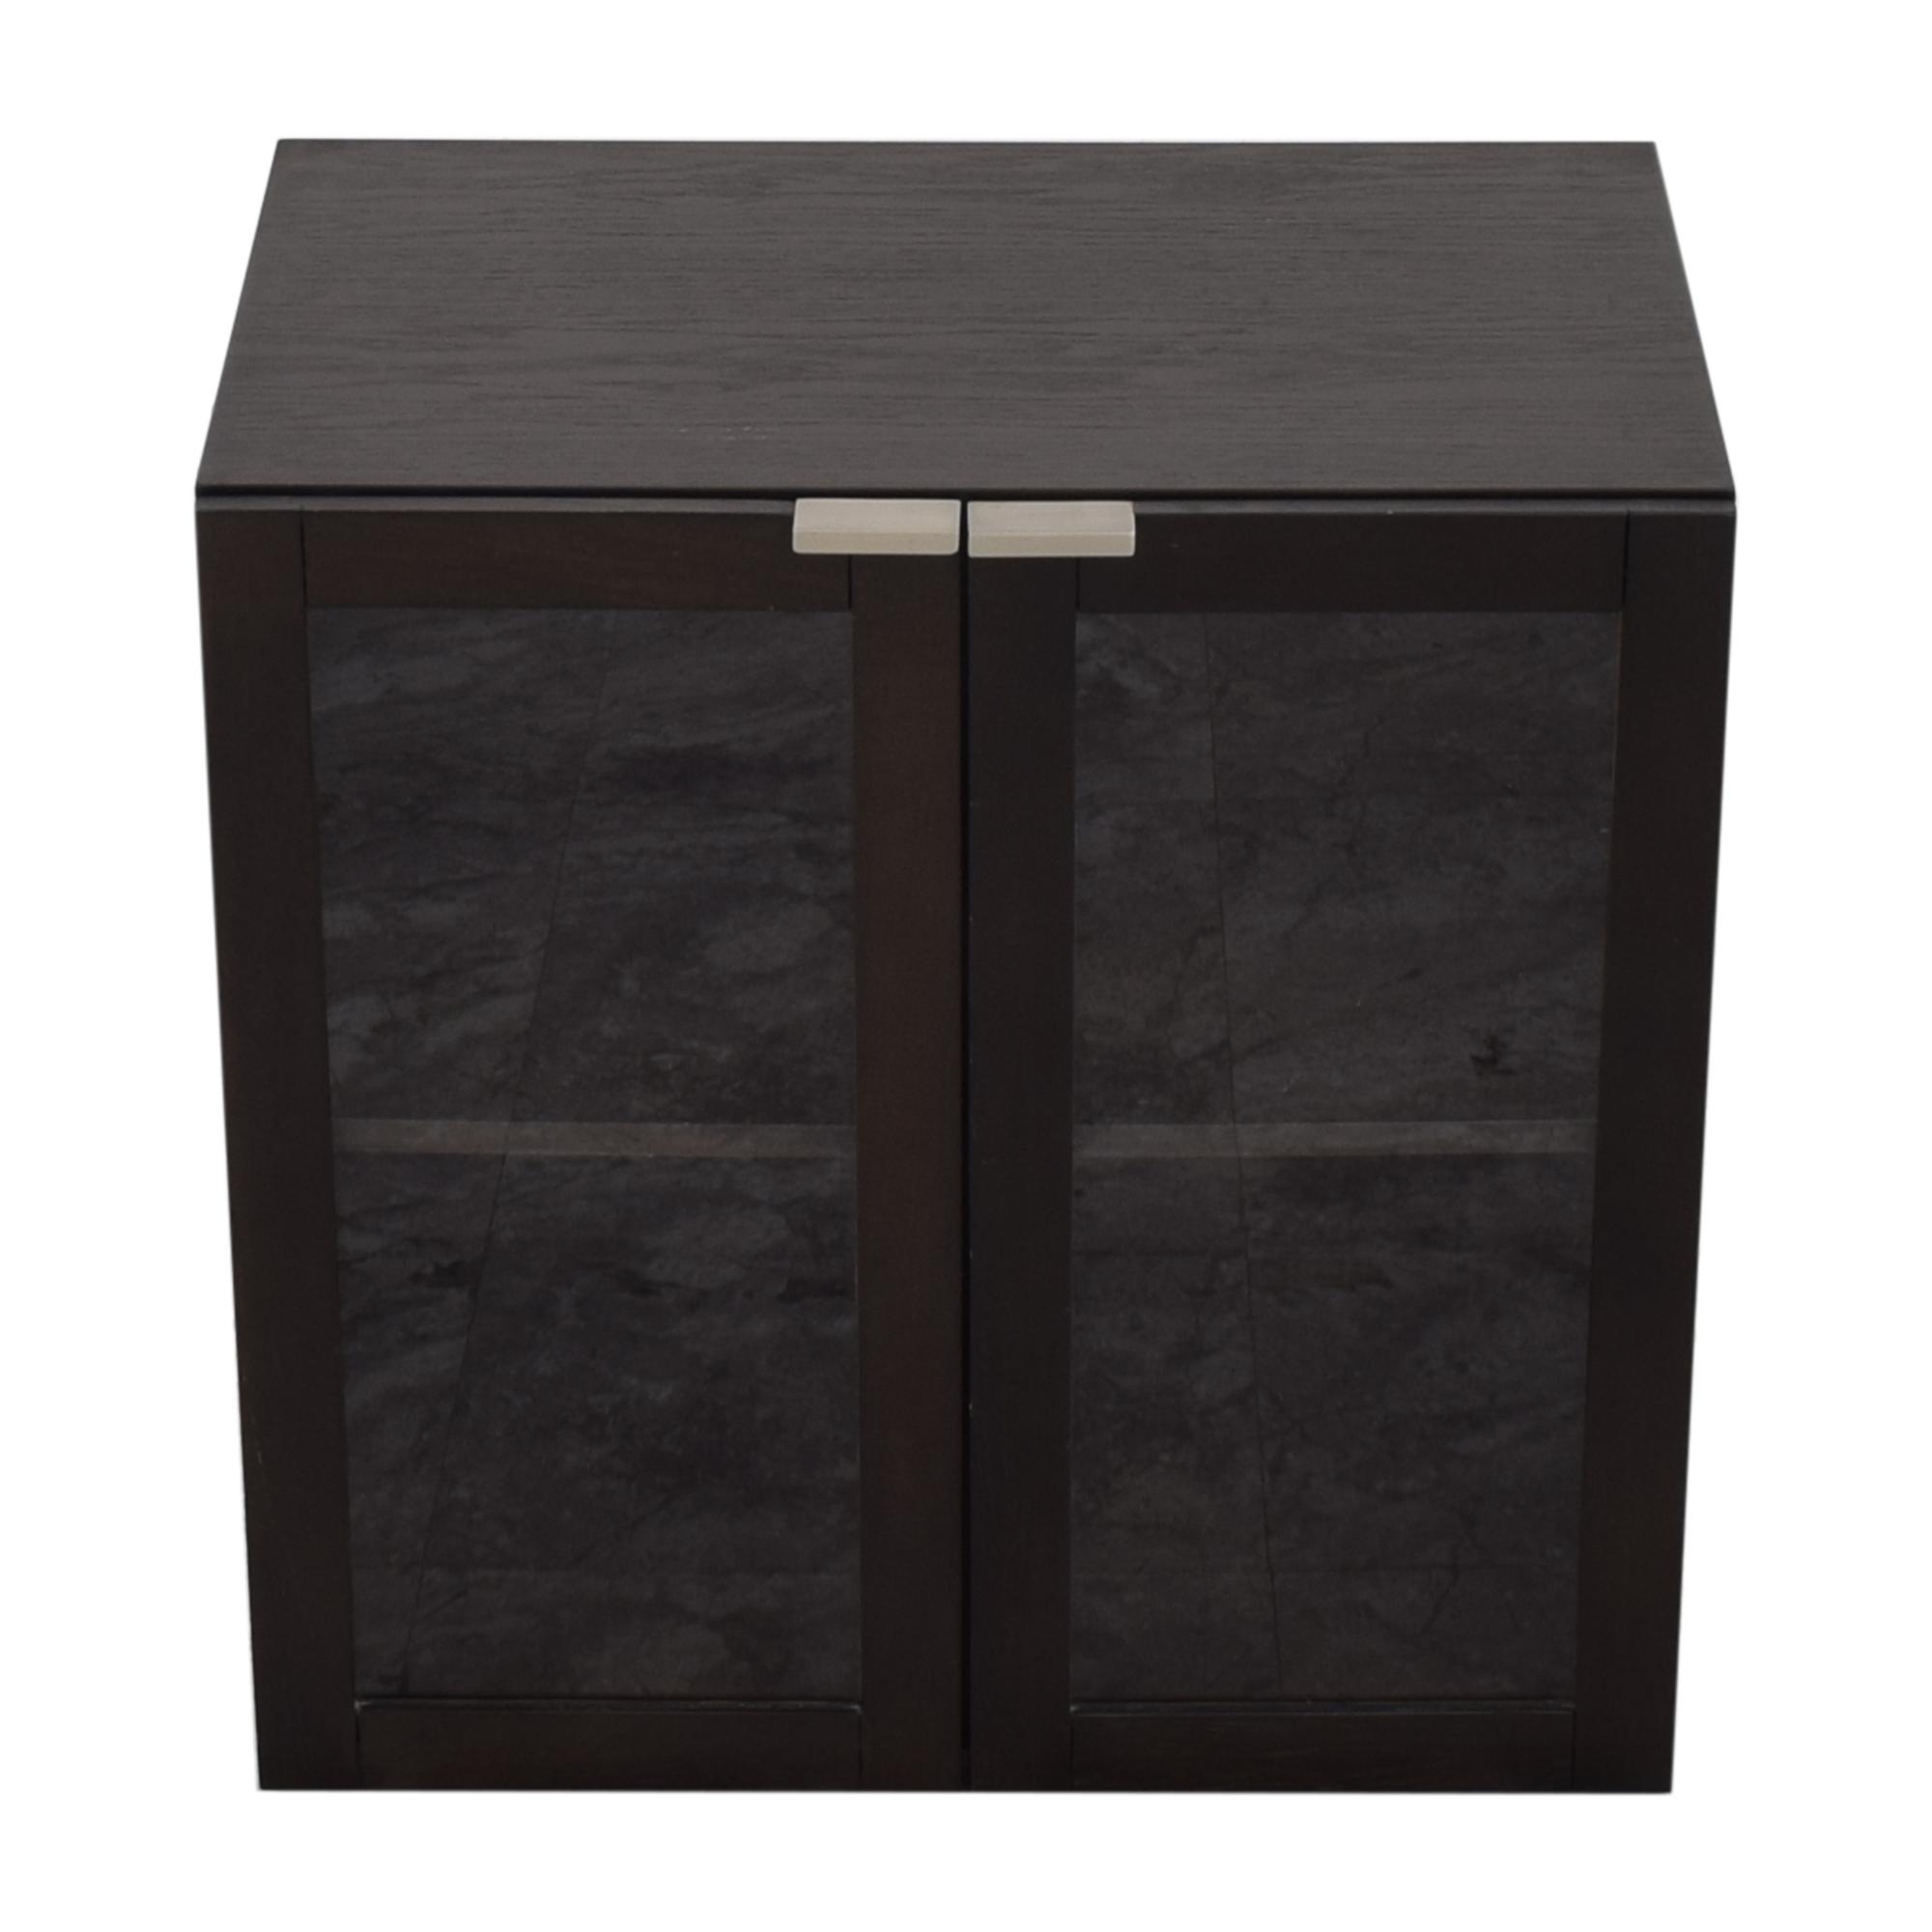 buy West Elm West Elm Everywhere Storage Two Door Cabinet online